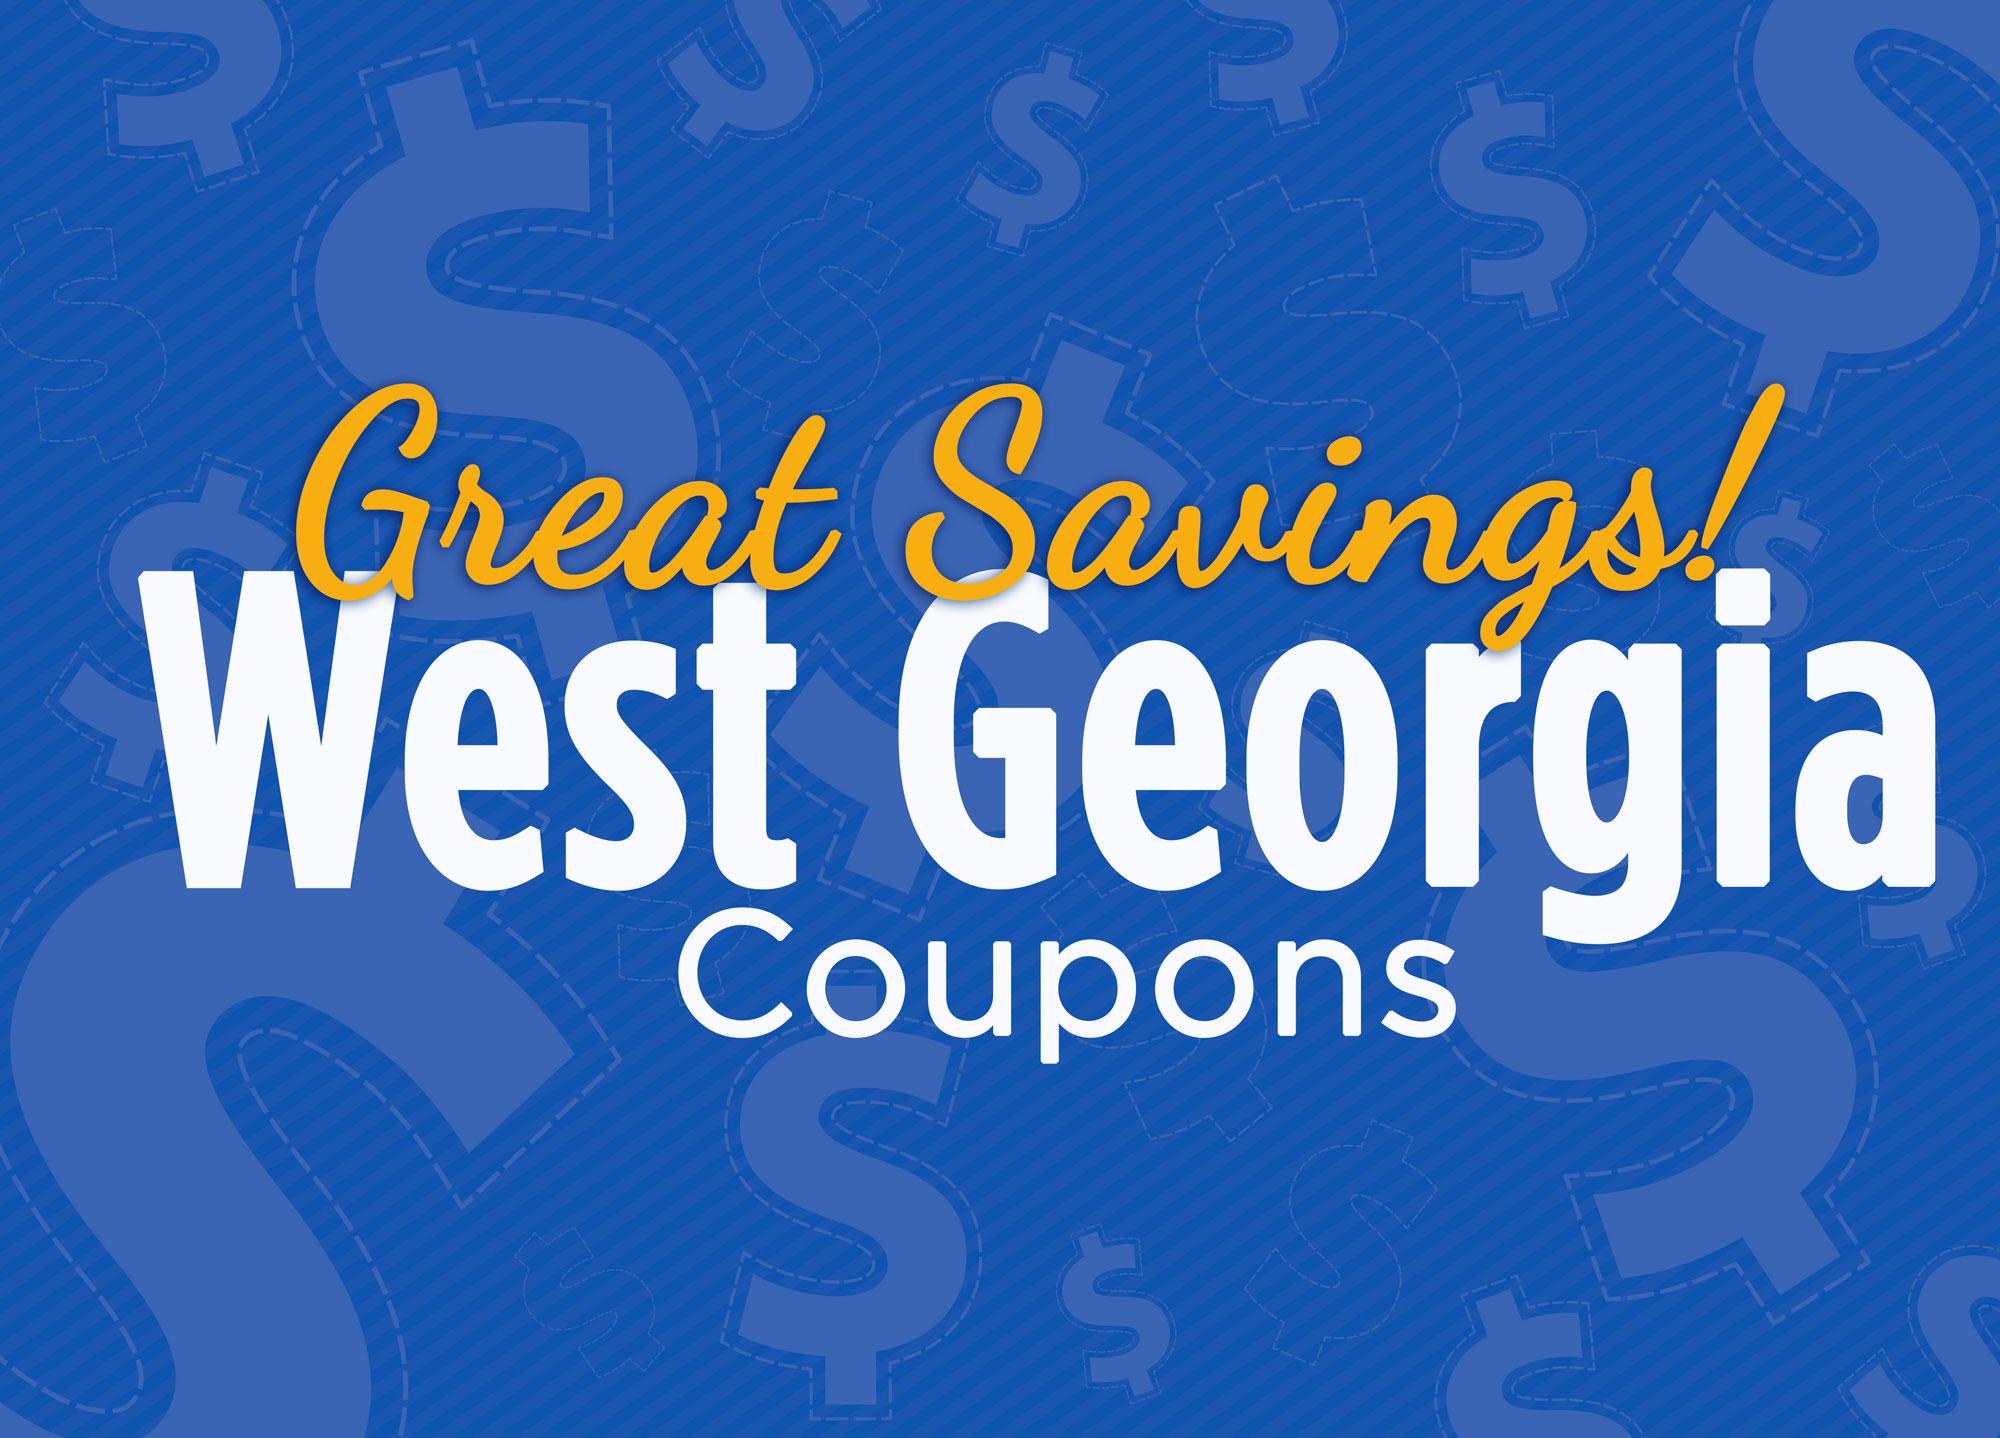 Great Savings - West Georgia Coupons